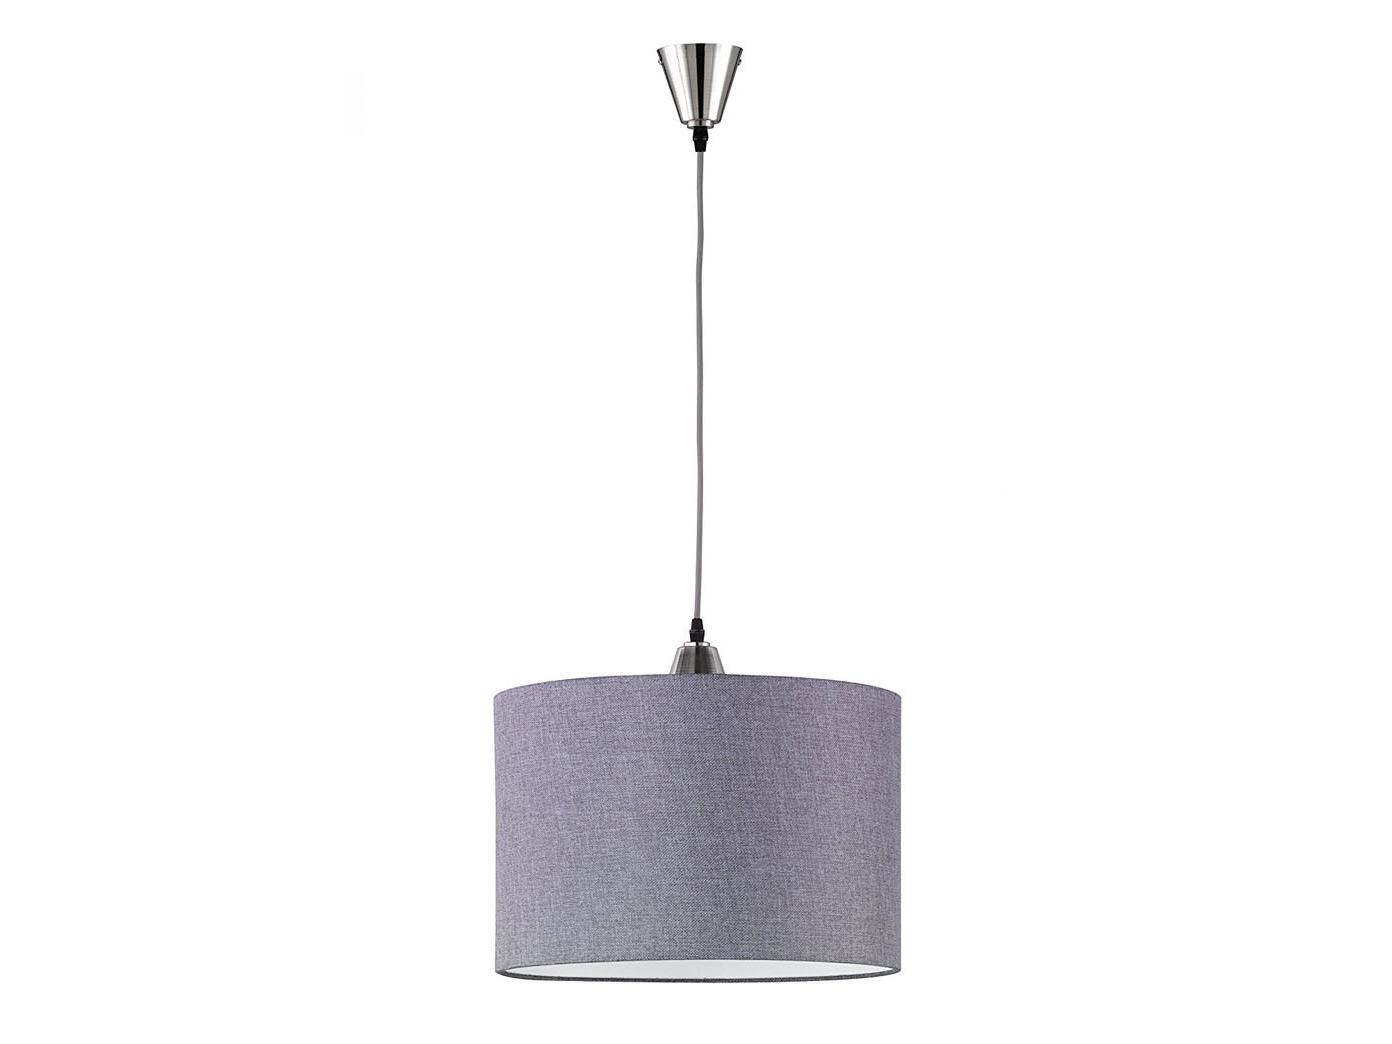 Lampe Kuche Simple Inspiration Lampe Kche Und Led